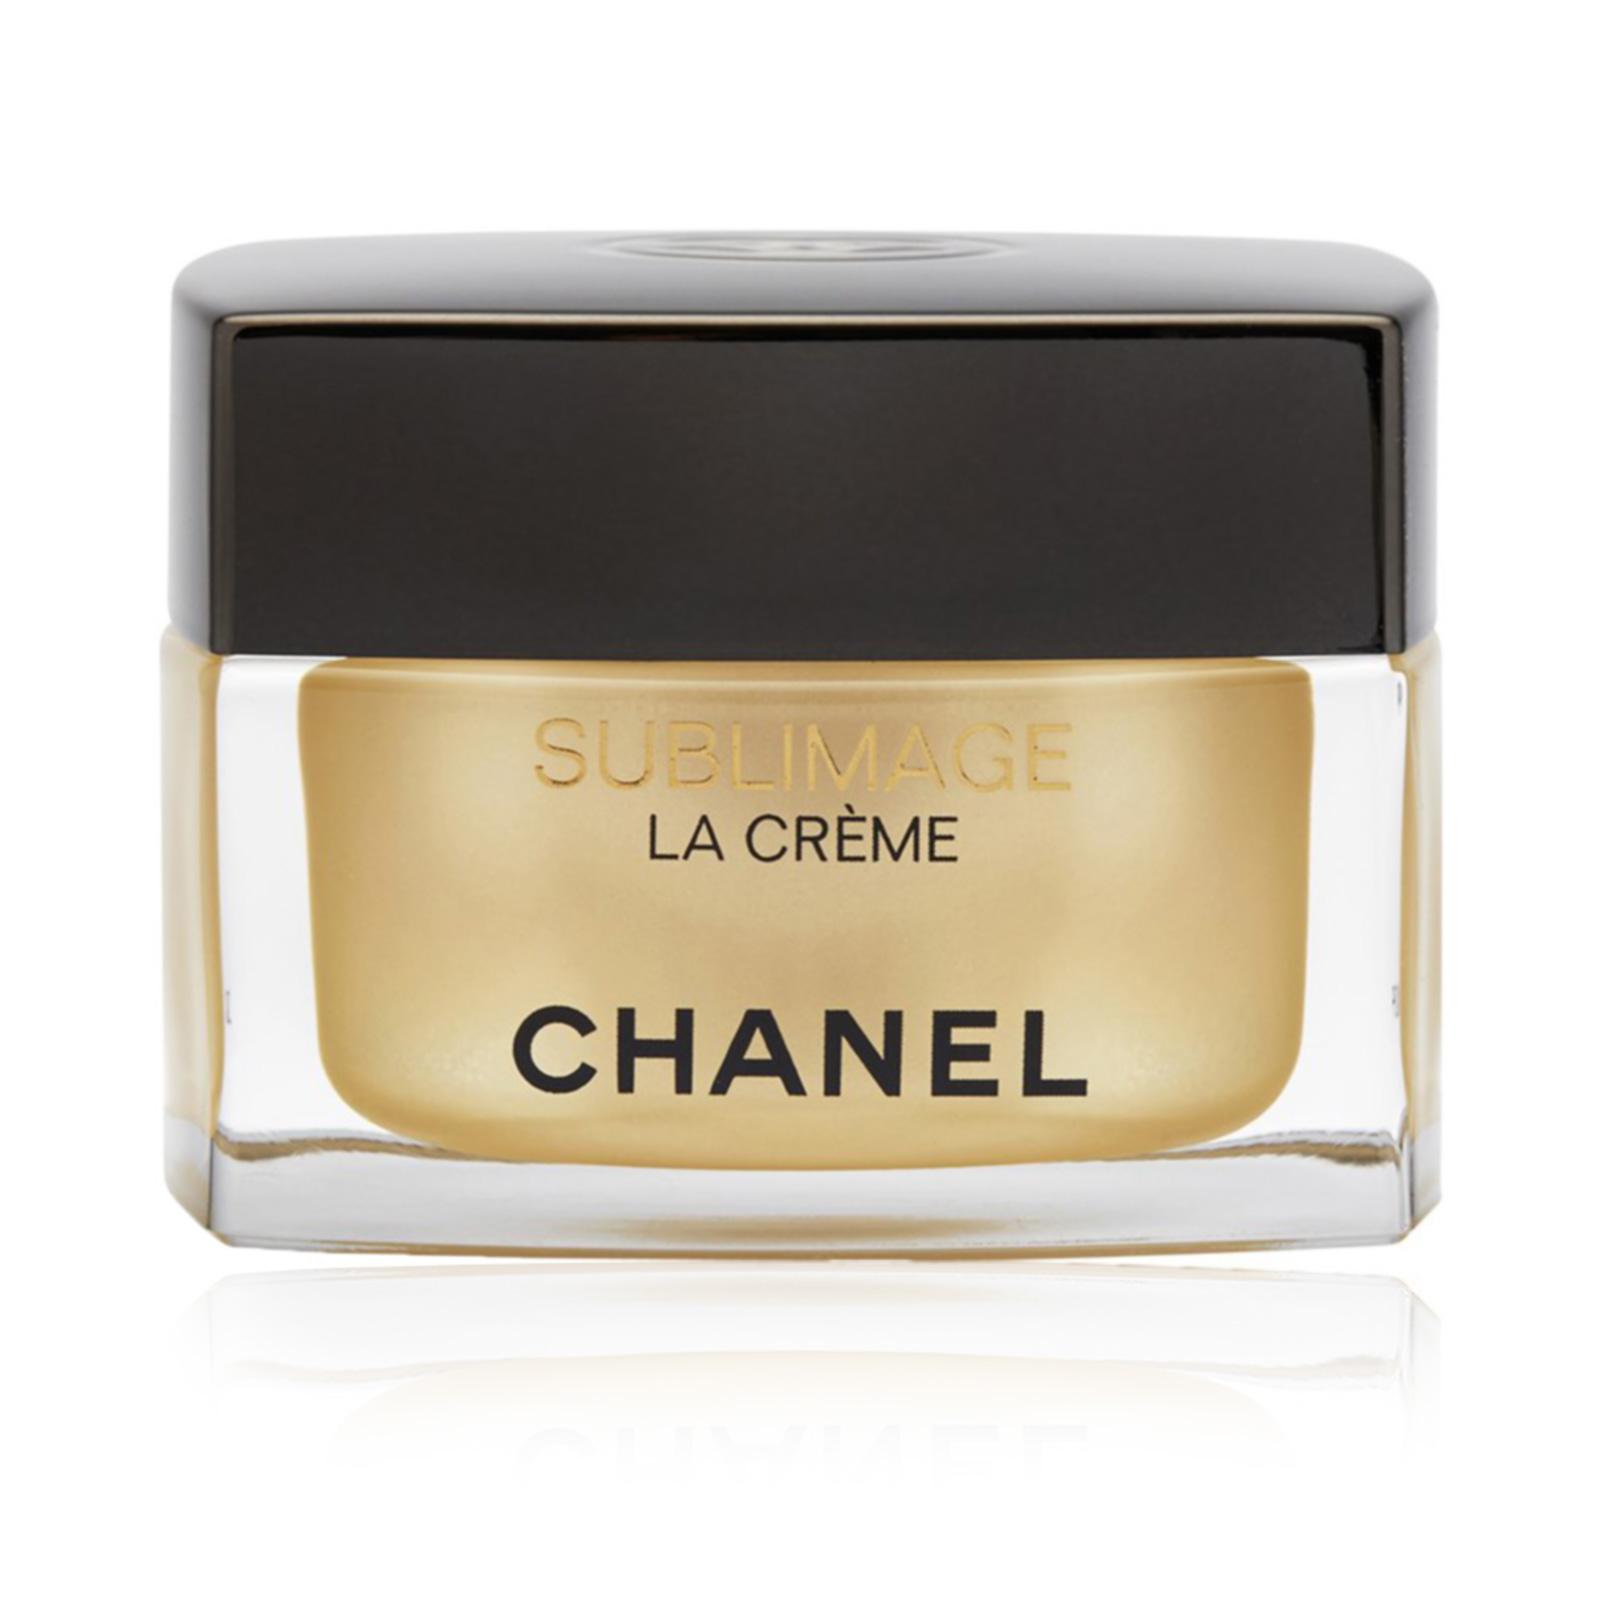 Sublimage La Creme Ultimate Skin Regeneration